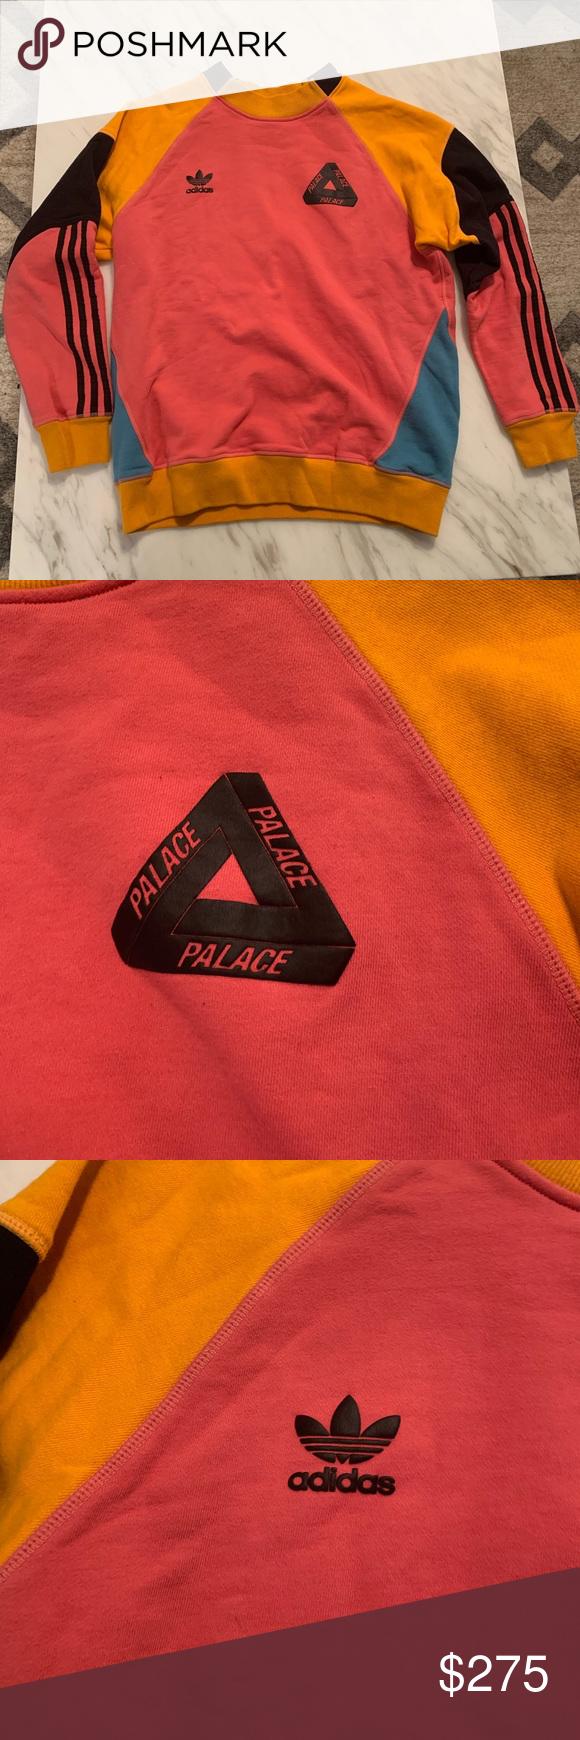 Men S Adidas X Palace Crew Neck Sweater Crew Neck Sweater Colorful Sweatshirt Crew Neck Sweatshirt [ 1740 x 580 Pixel ]